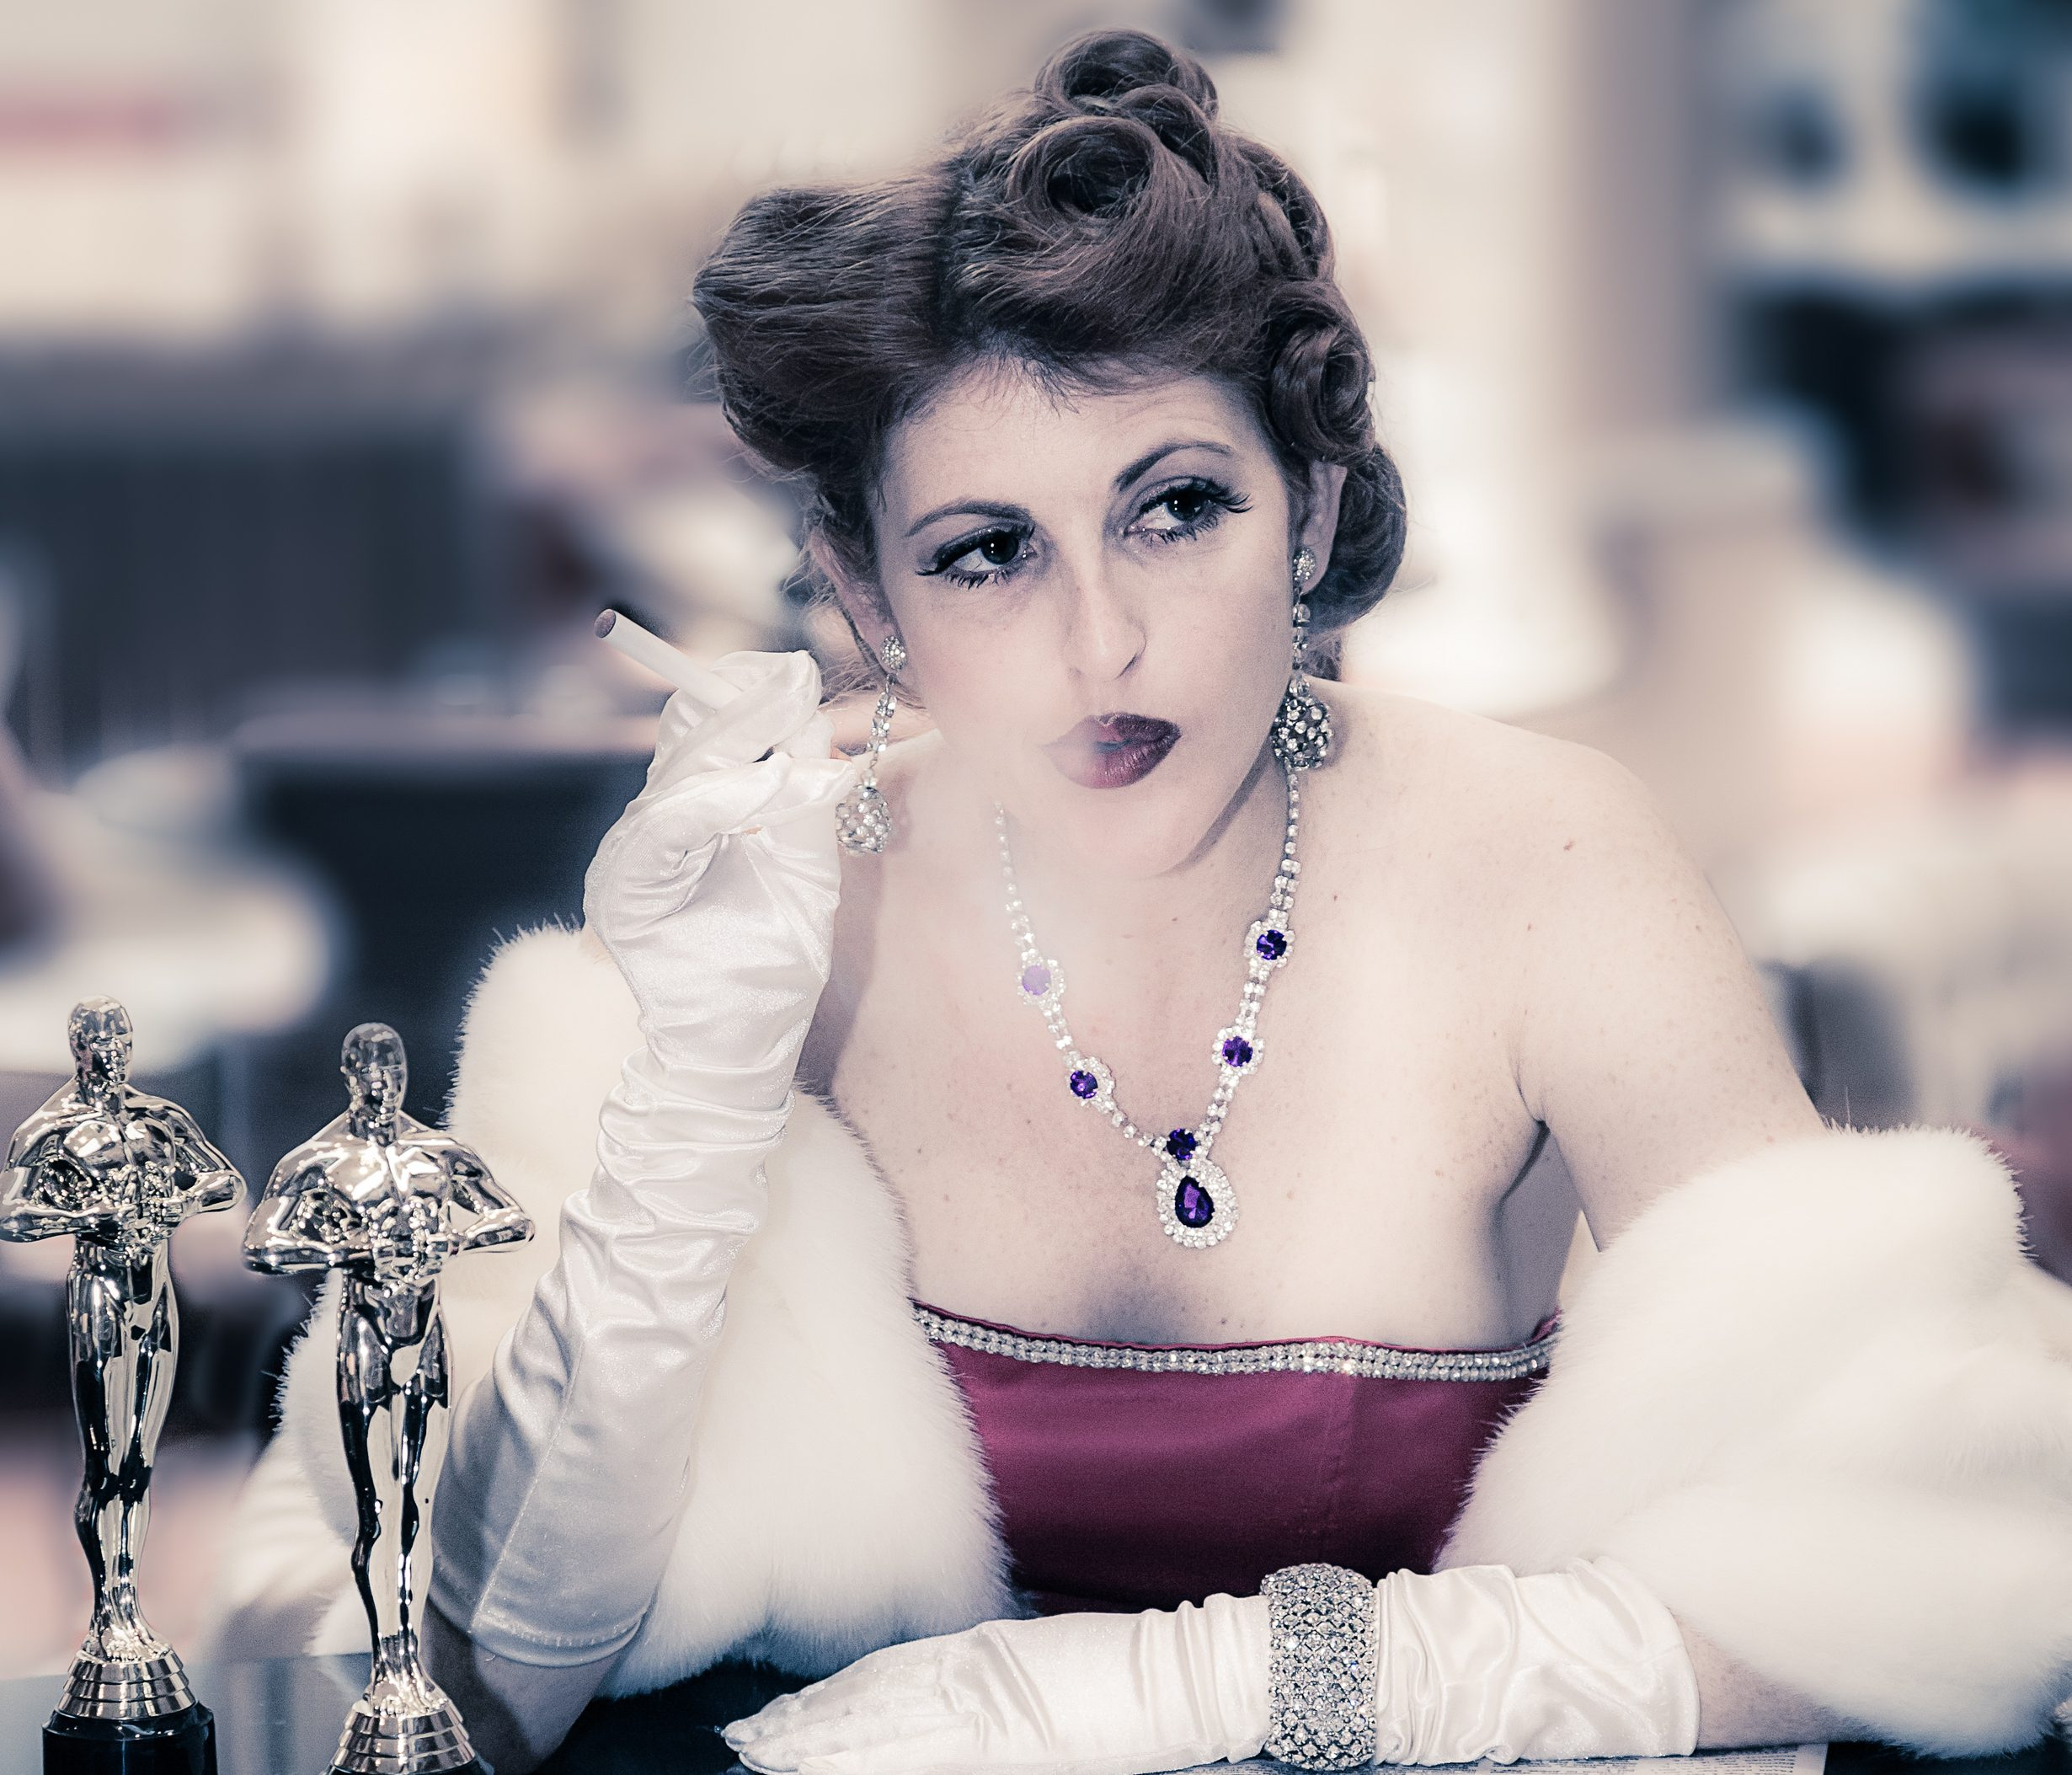 Bette Davis Aint For Sissies - CurtainTimes